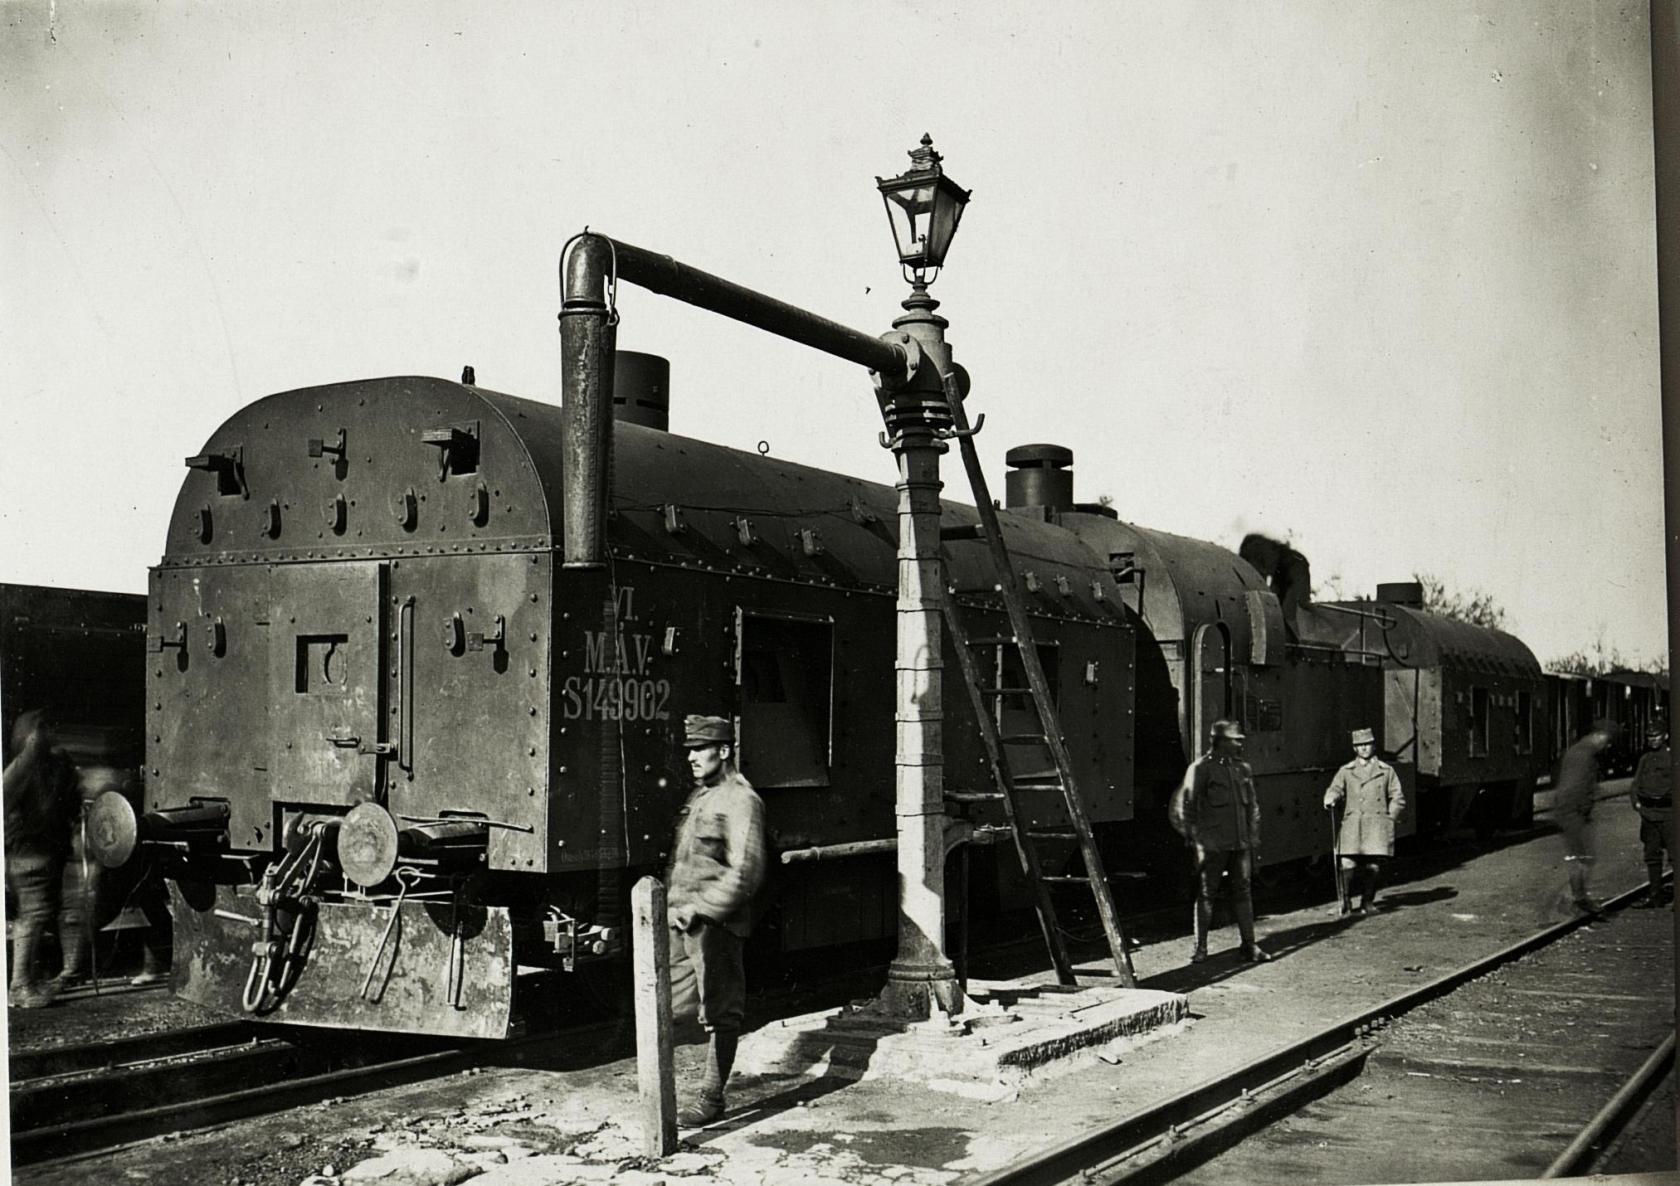 Panzerzug am Bahnhof in Ciezow, 21. Mai 1917.